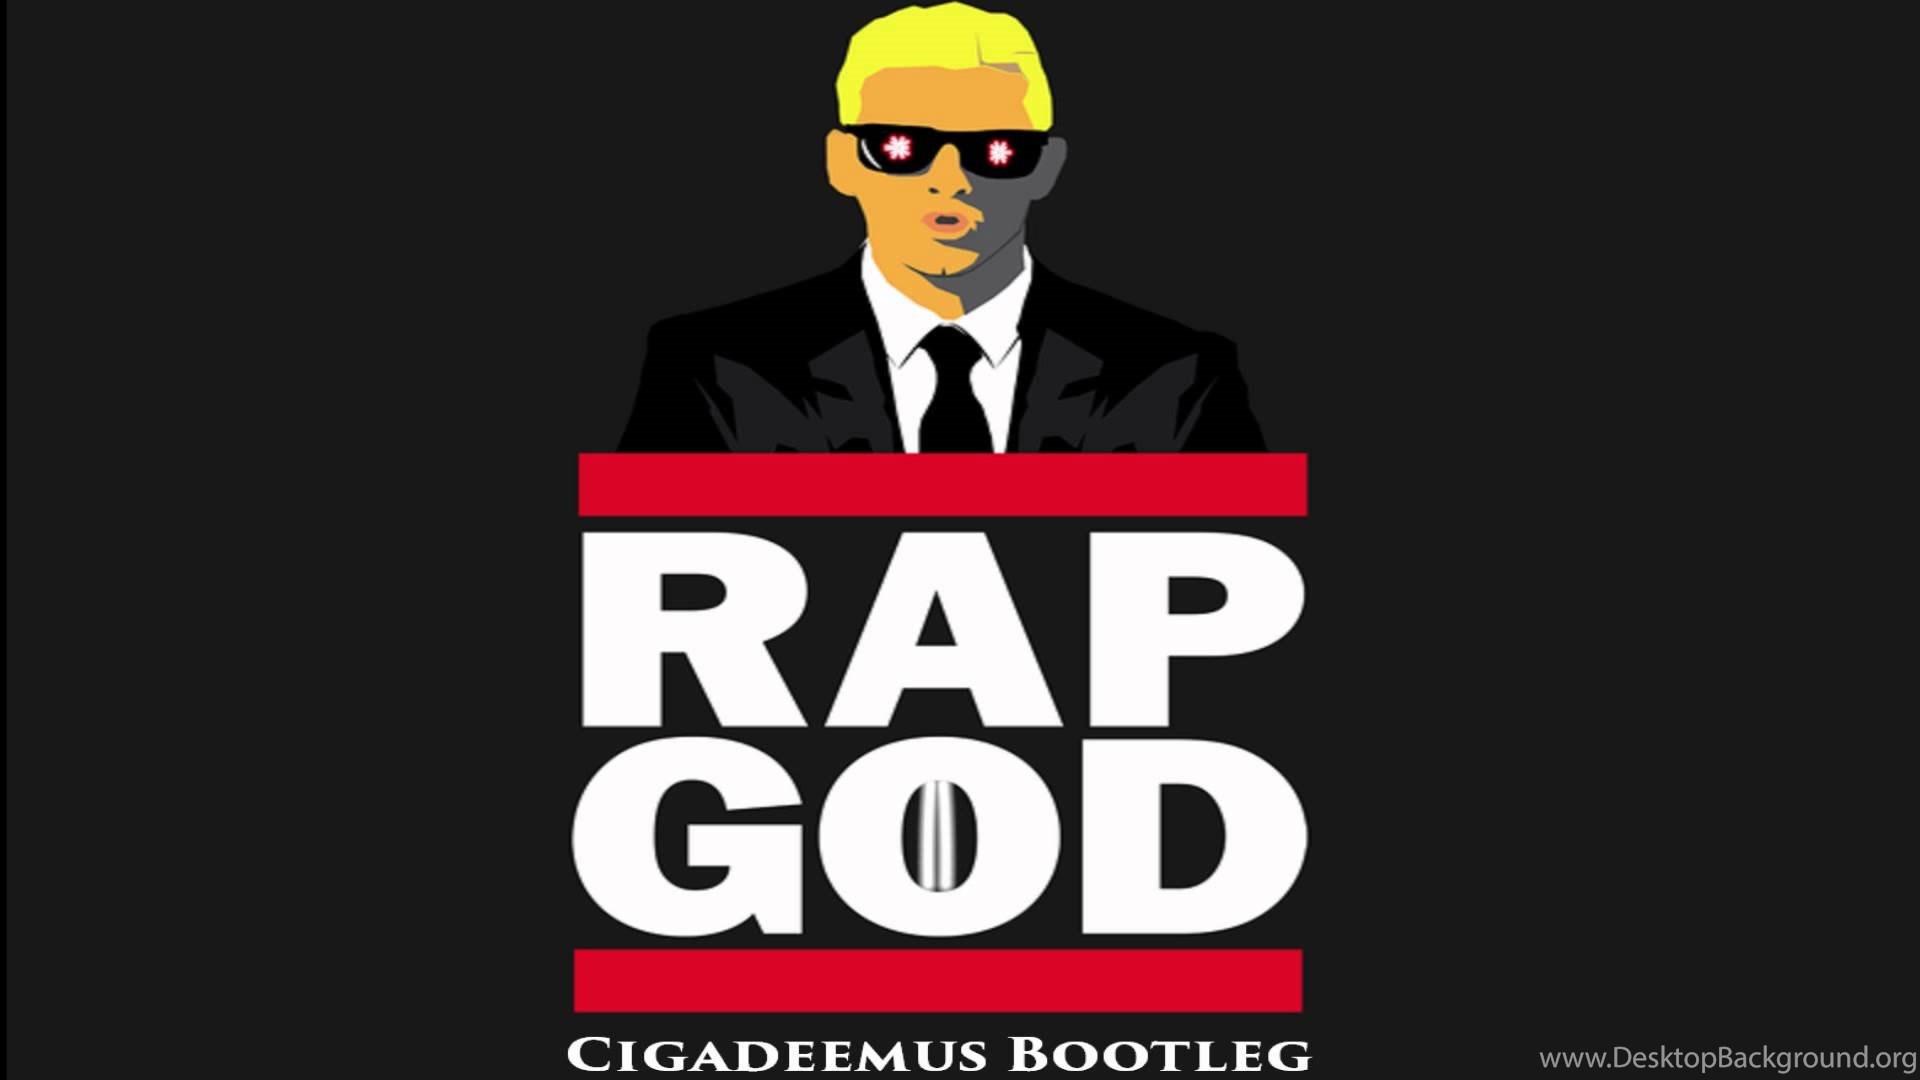 Eminem Rap God (Cigadeemus Bootleg) {Free DL Link} (Drum And